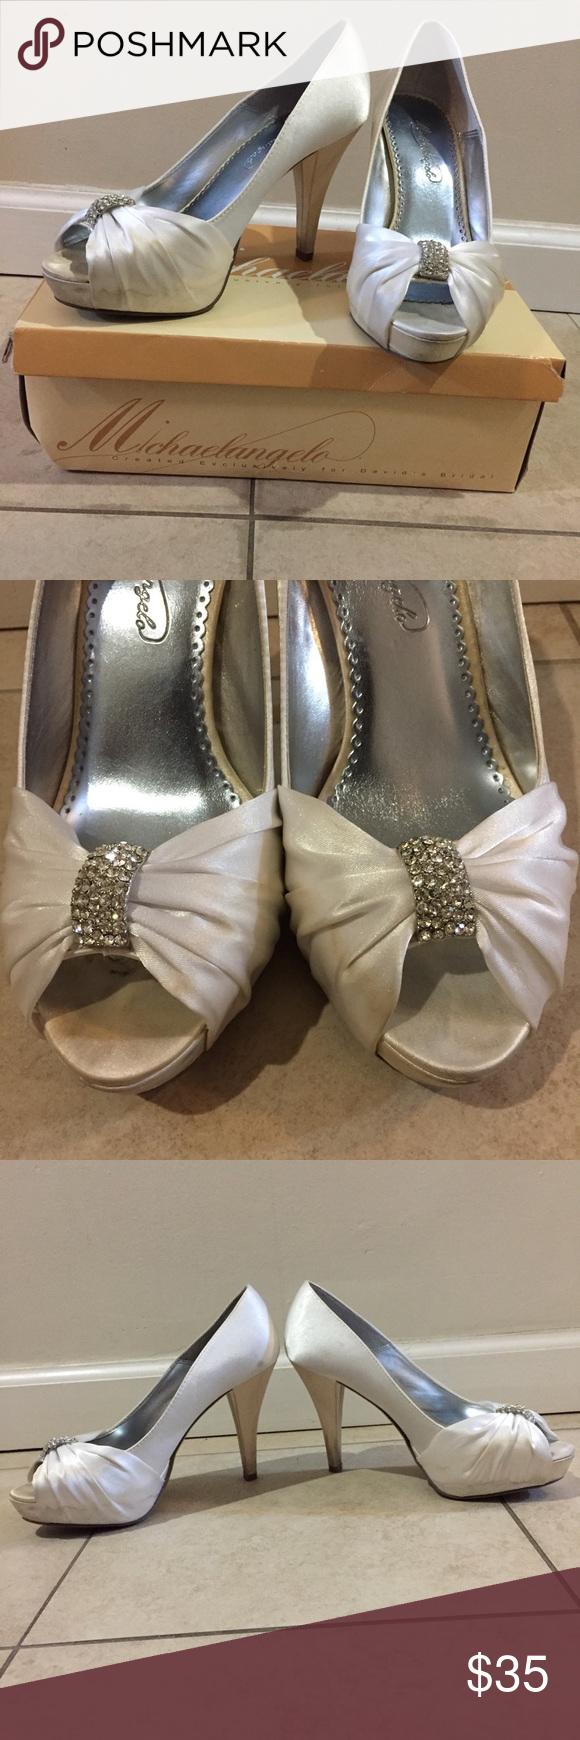 Michaelangelo wedding dress  Michaelangelo White Peep Toe Heeled Wedding Shoes Please note the